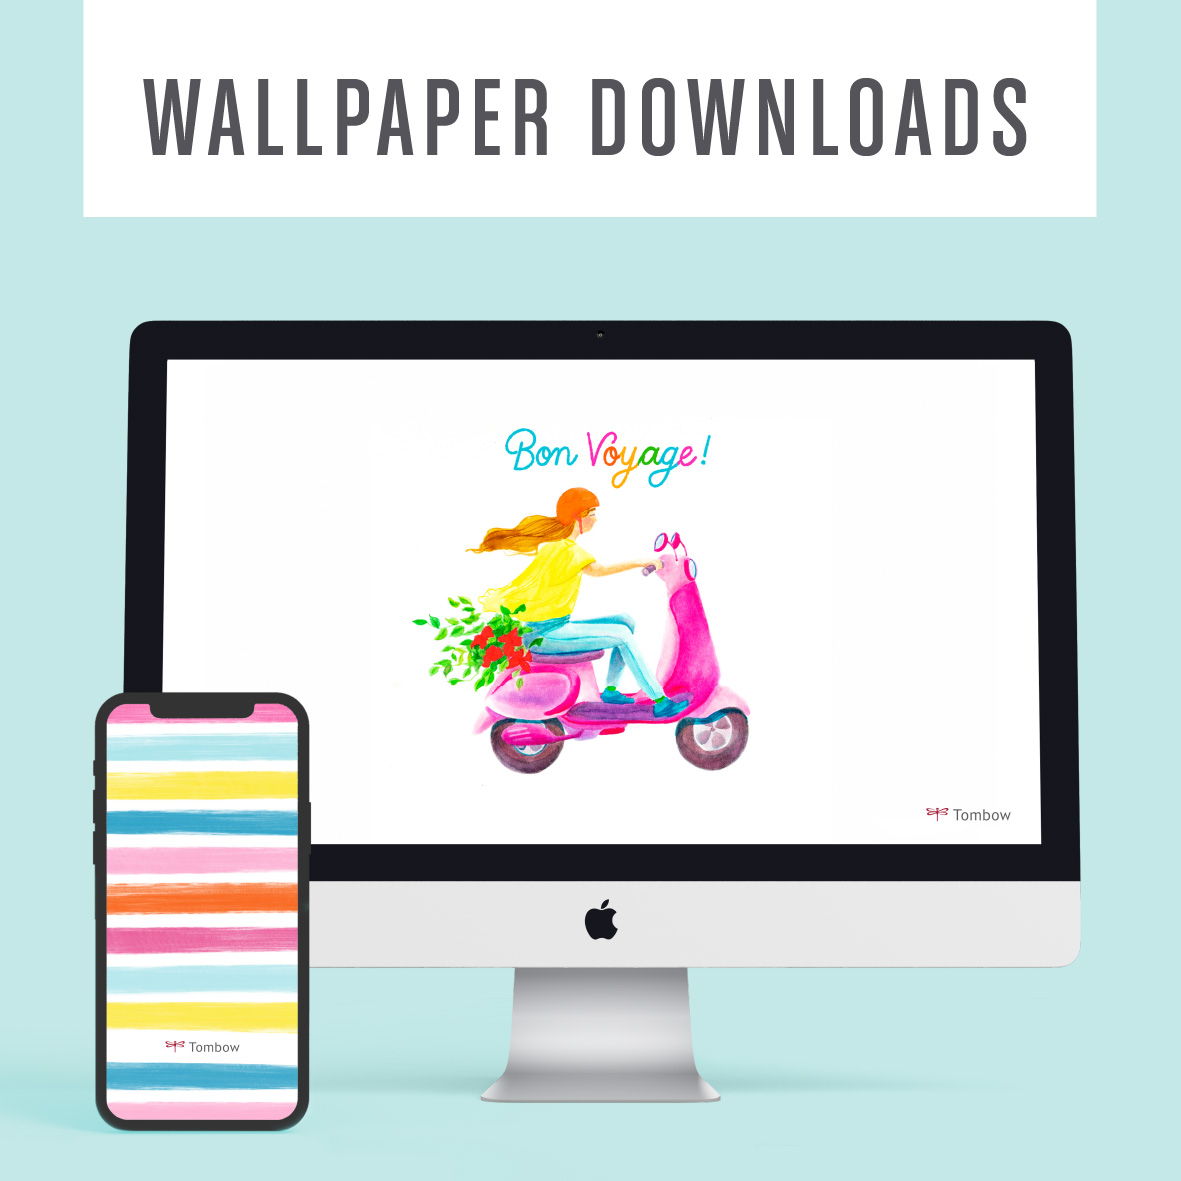 Tombow Free Wallpaper Downloads